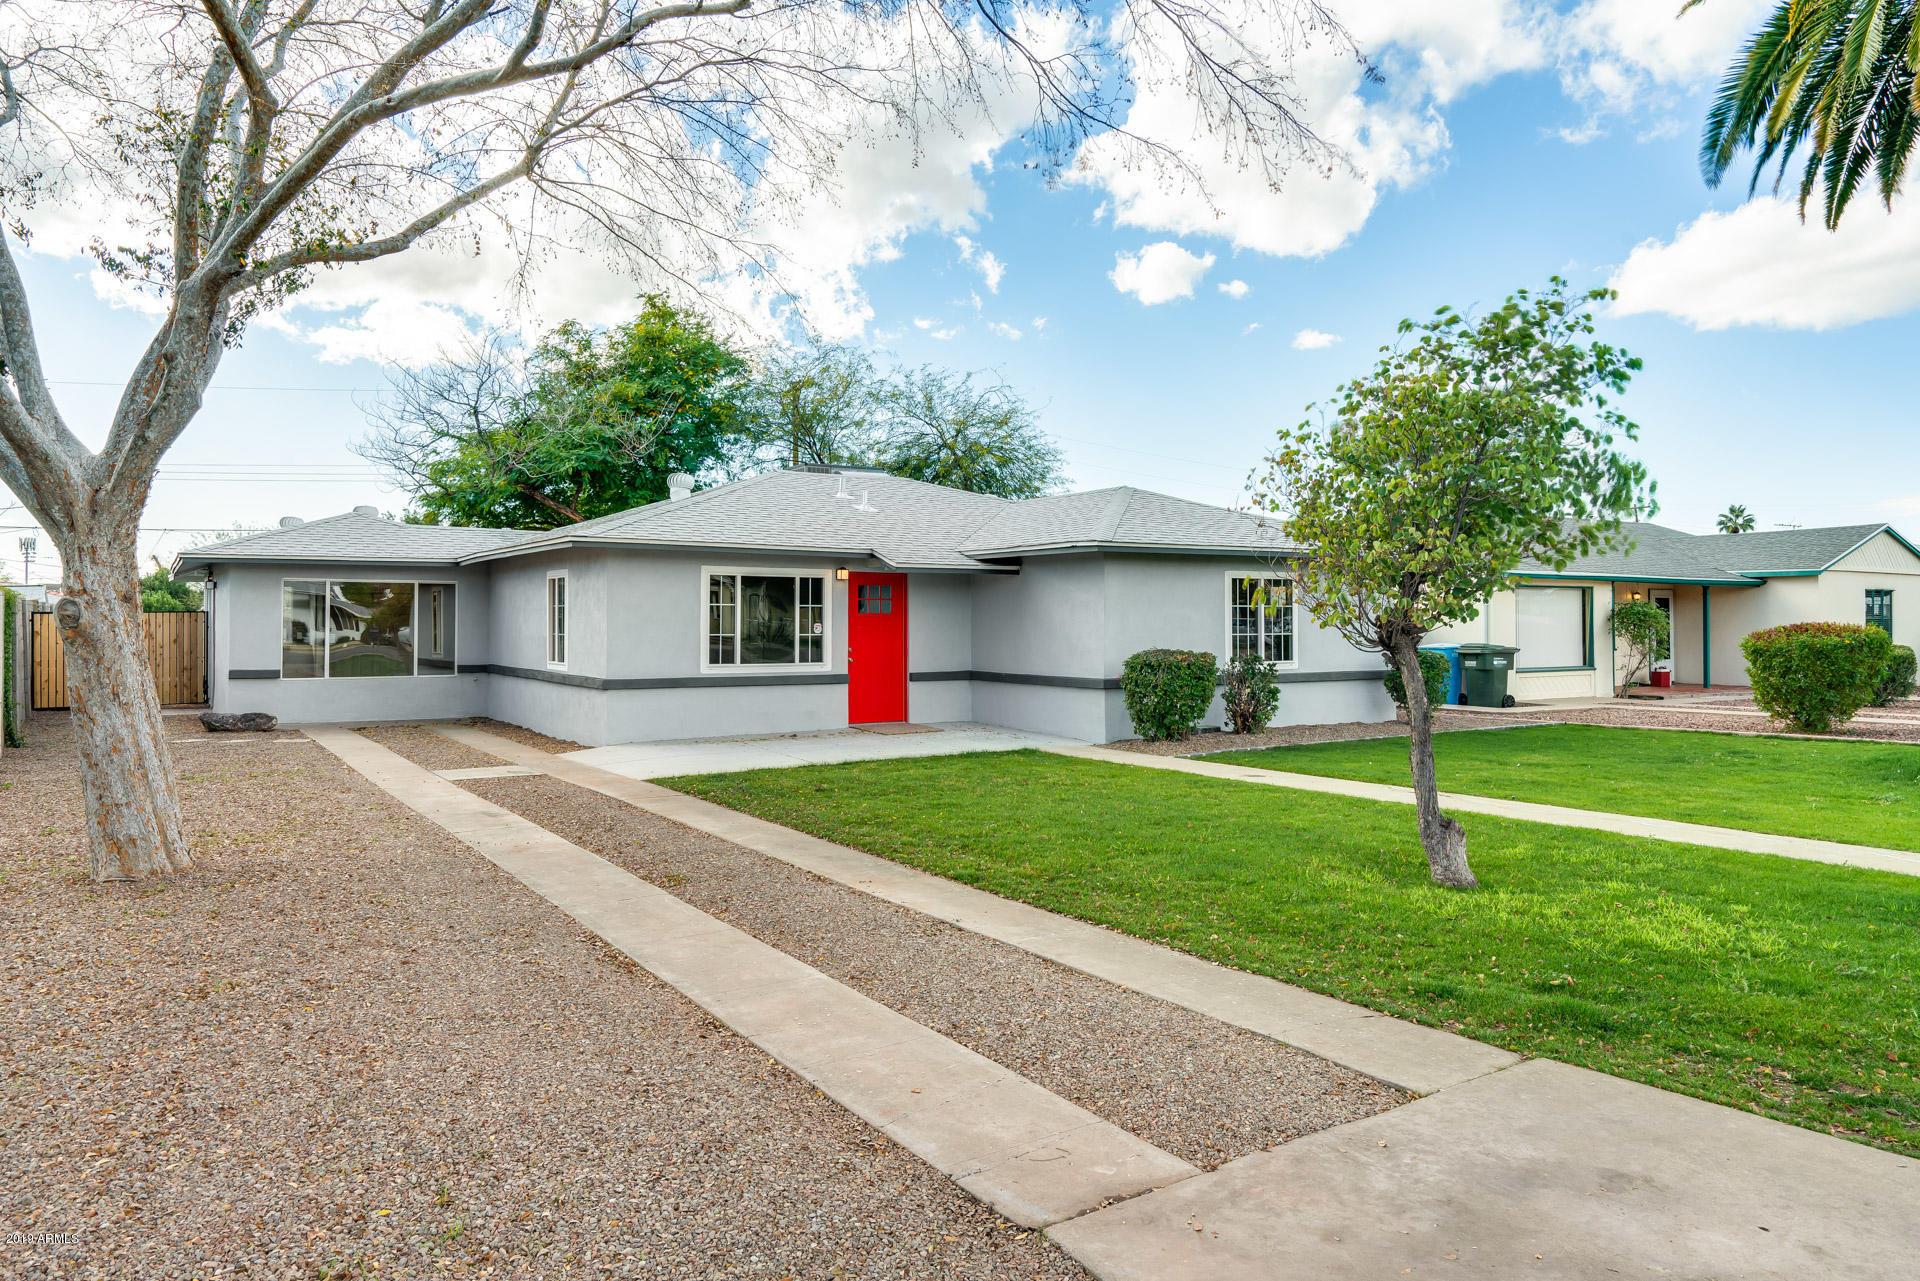 Photo of 4166 N 16TH Drive, Phoenix, AZ 85015